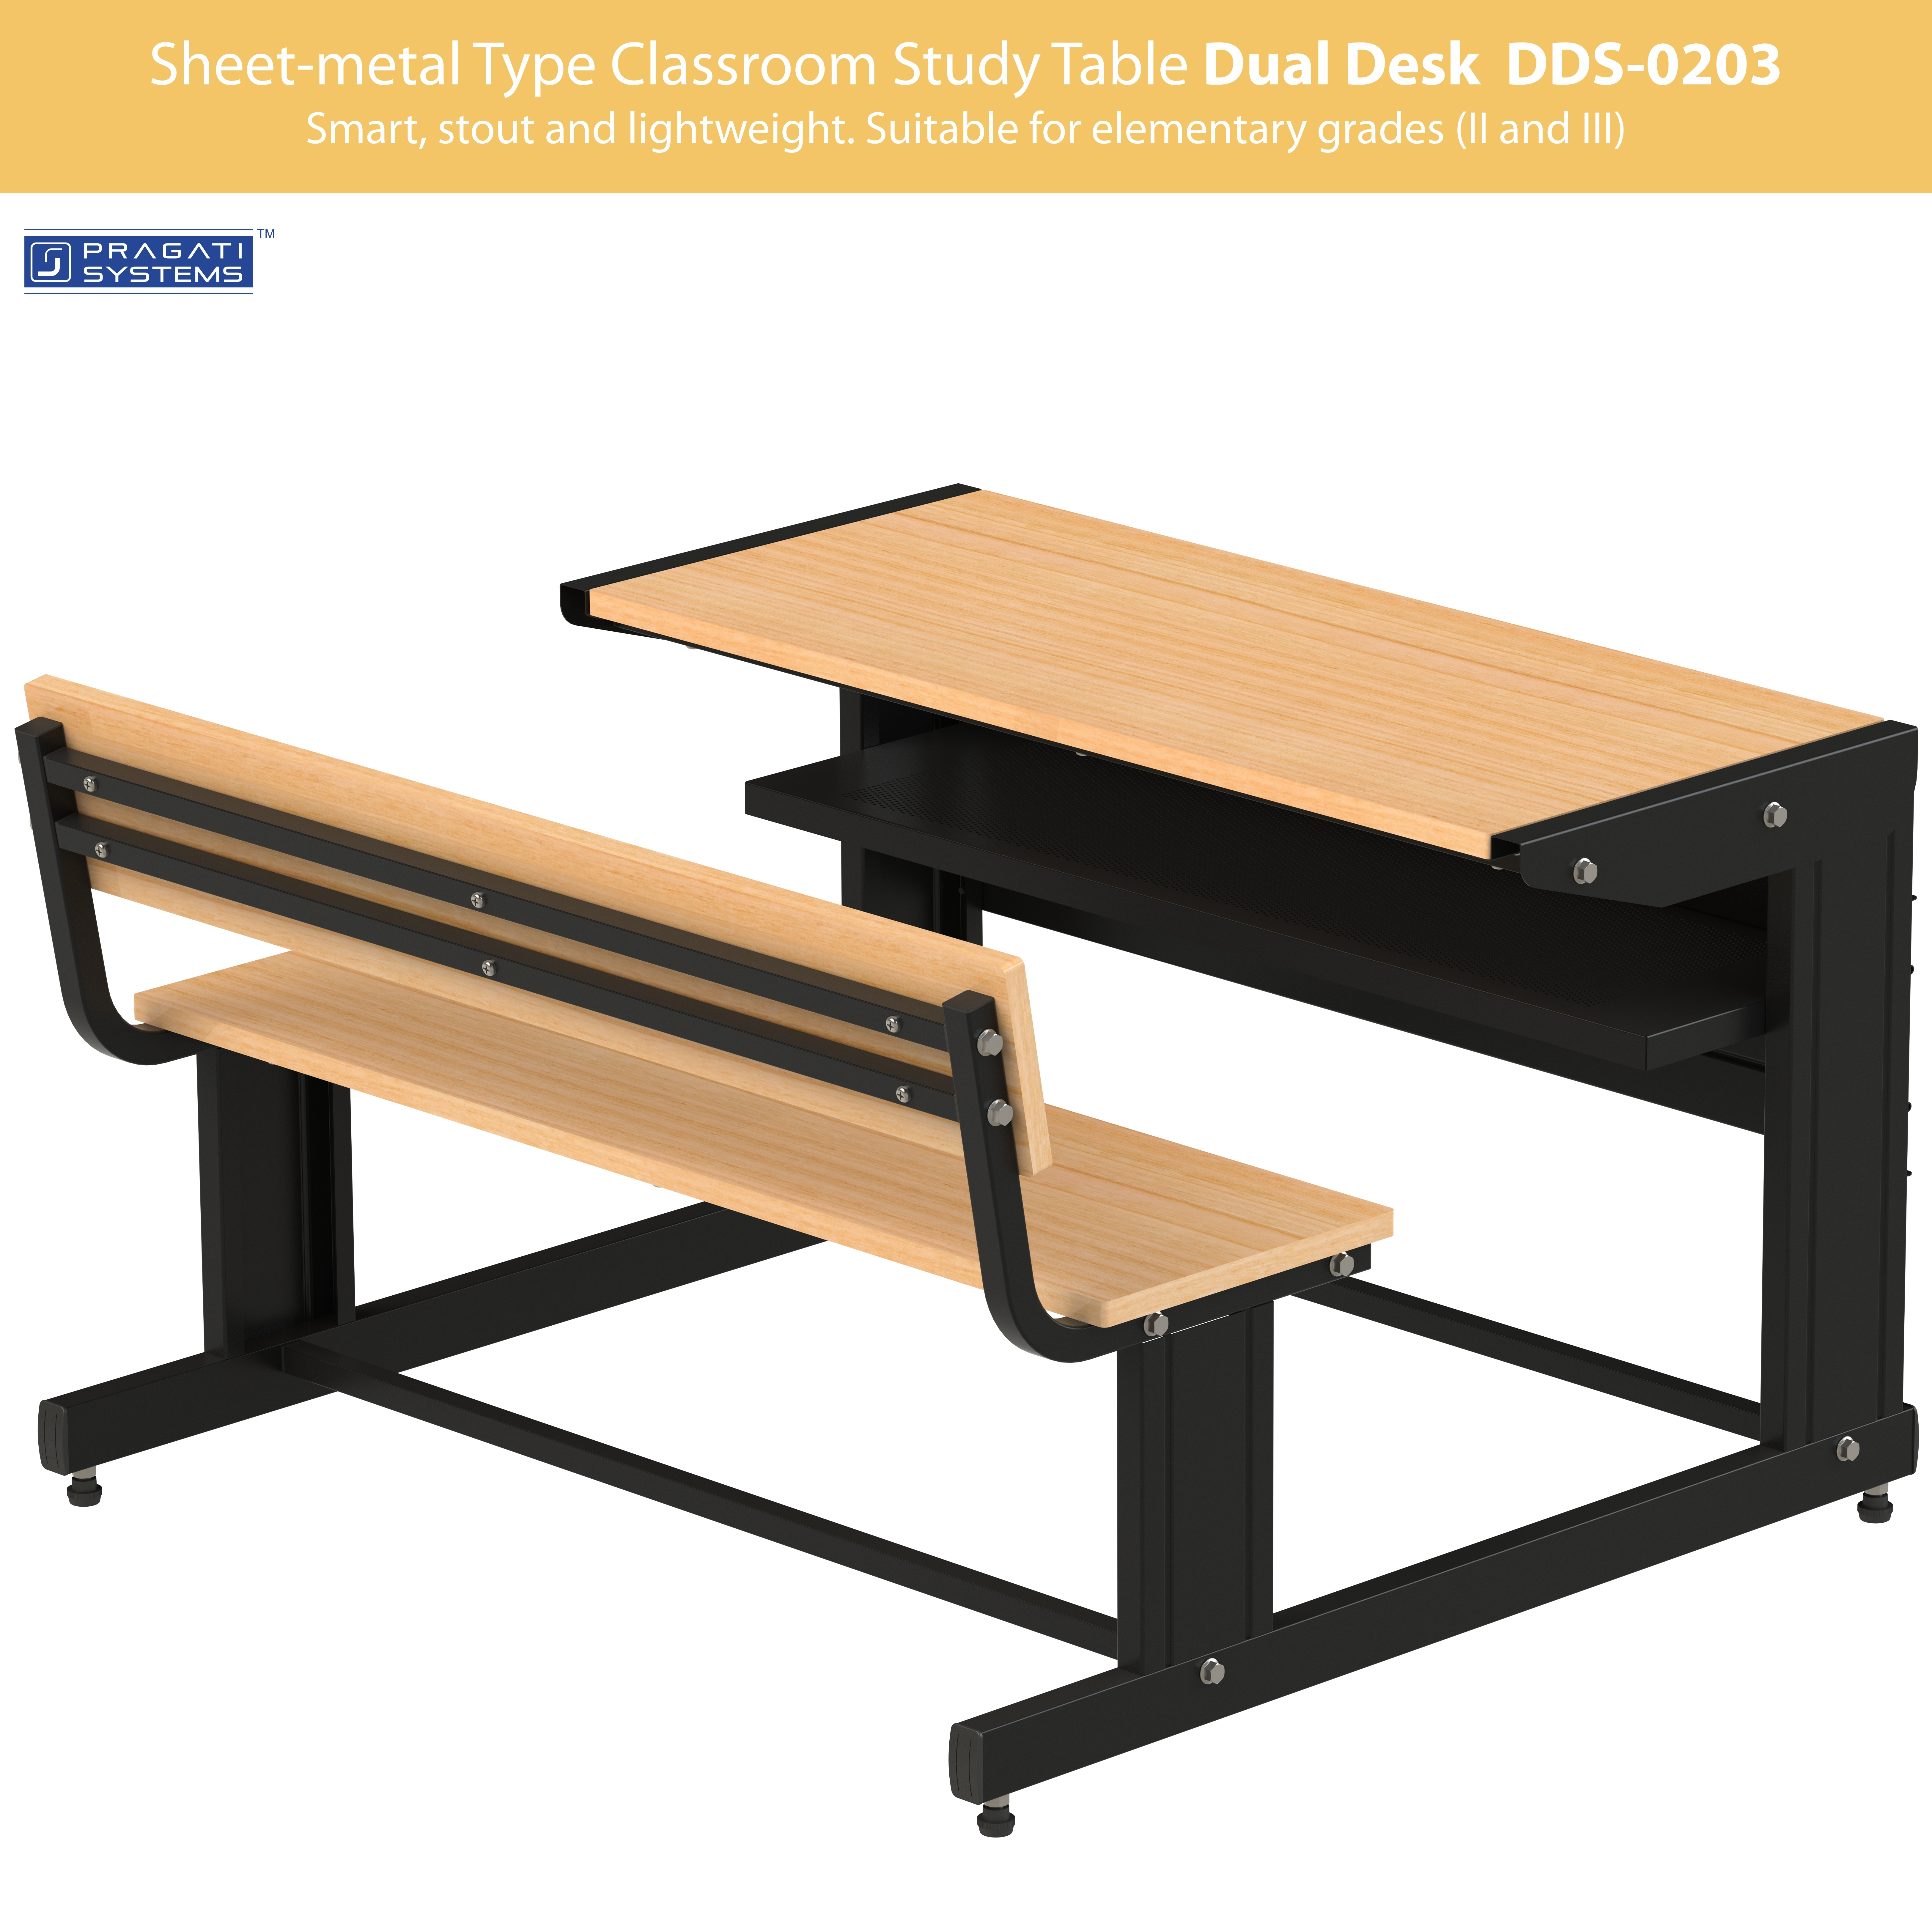 Sheet Metal Classroom Study Dual Desk Dds 0203